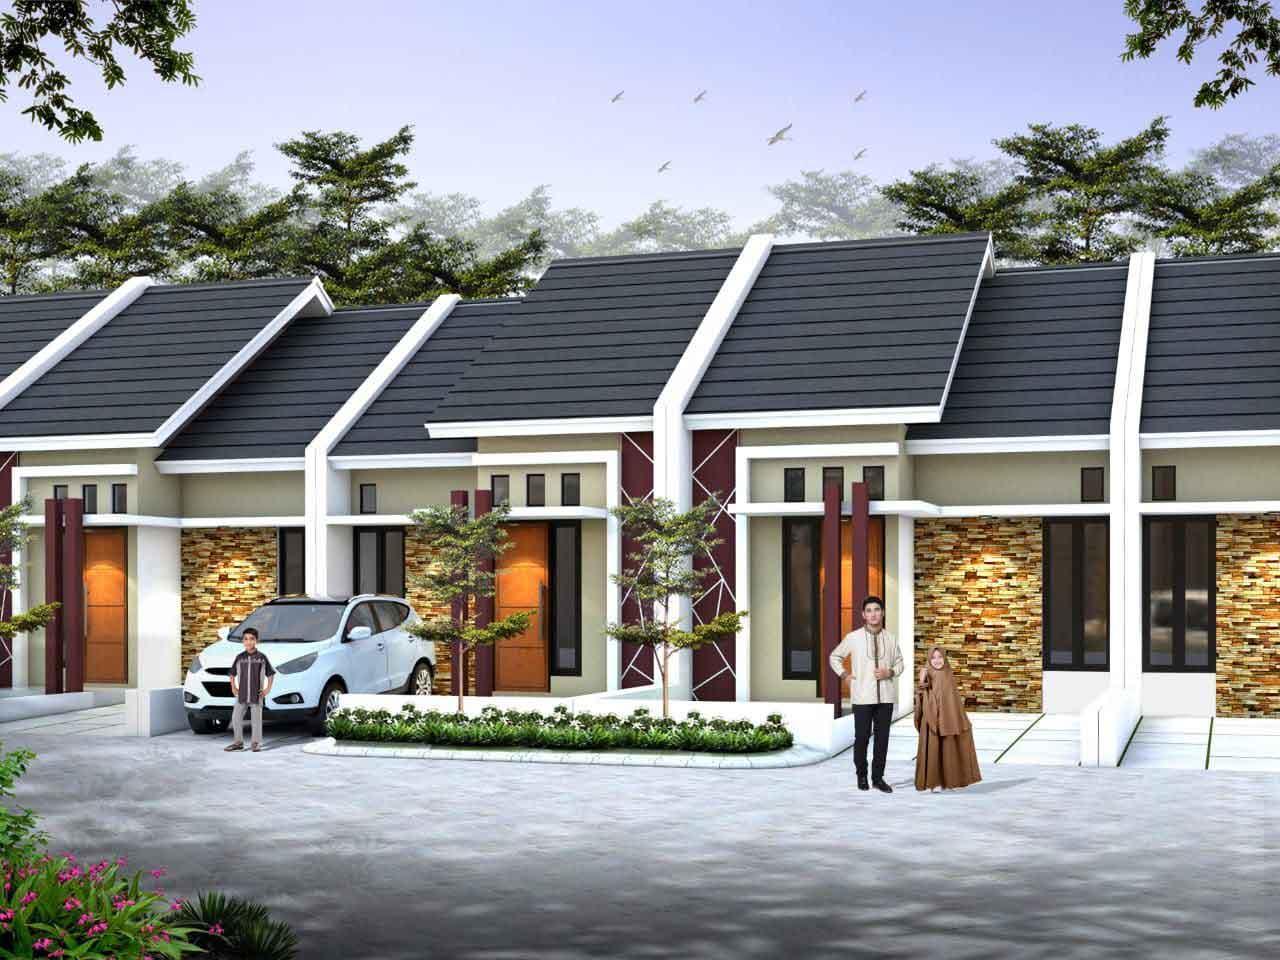 Denah Ruangan Terbaik Pada Rumah Dengan Luas Tanah 60 M2